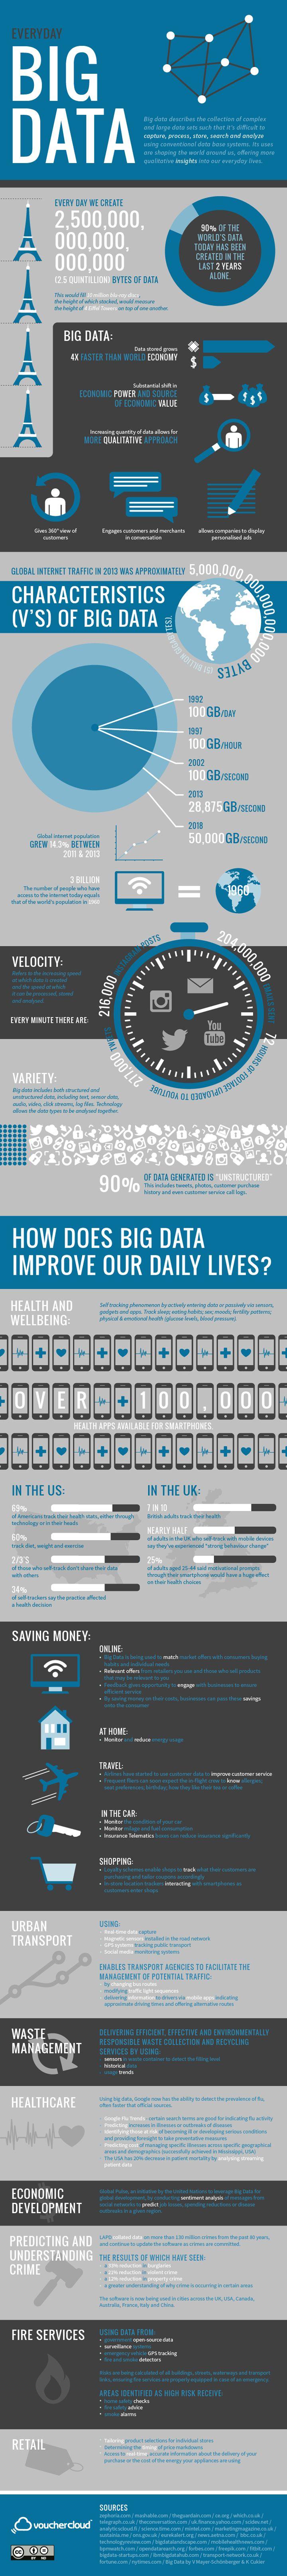 Everyday Big Data socialmedia mobile 31 best